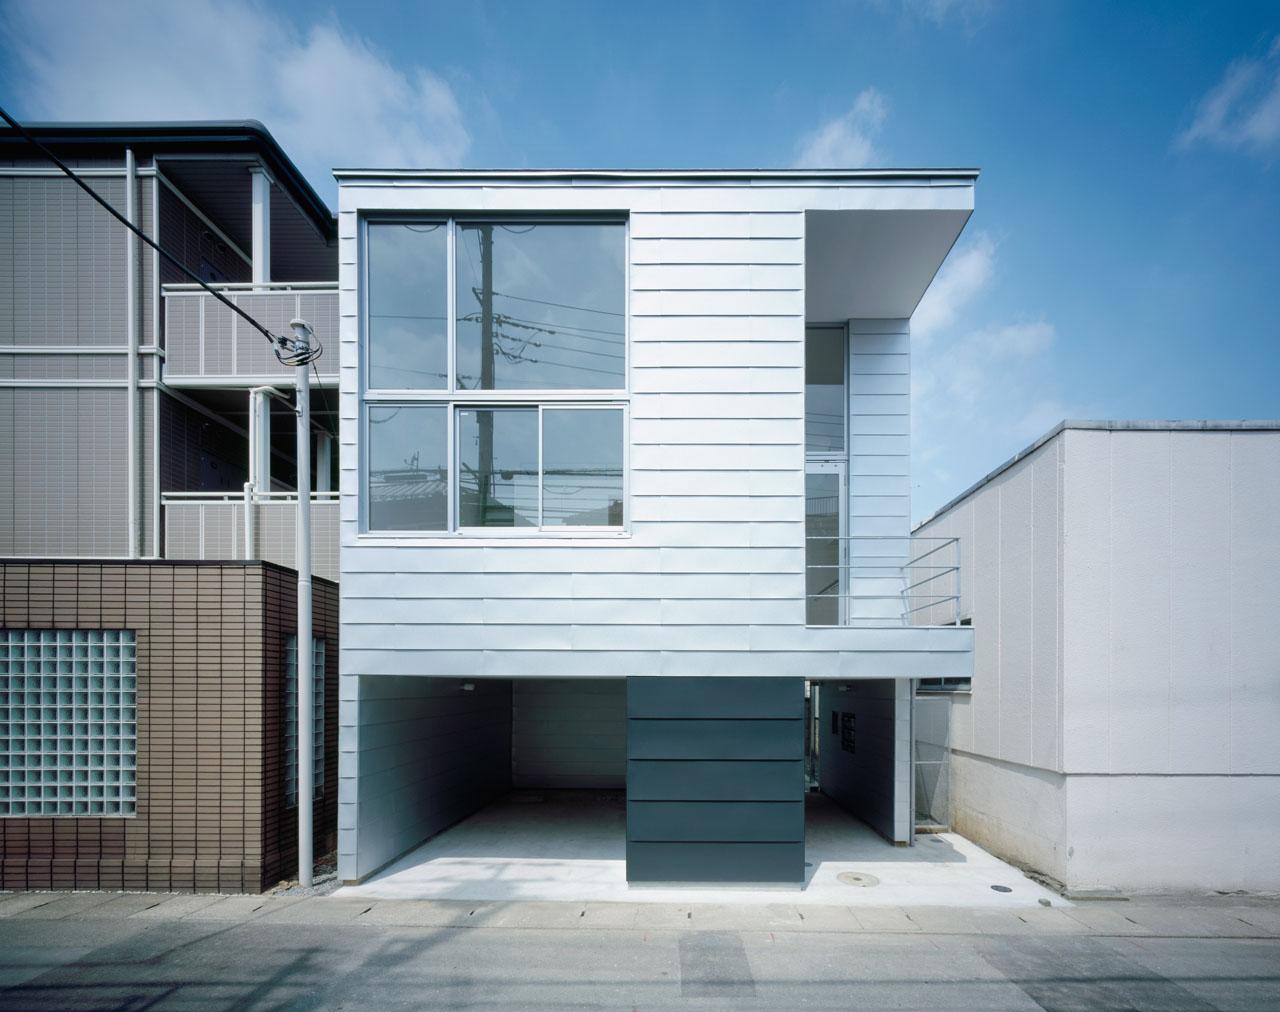 T-Apartment / Soeda and Architects, © Takumi Ota